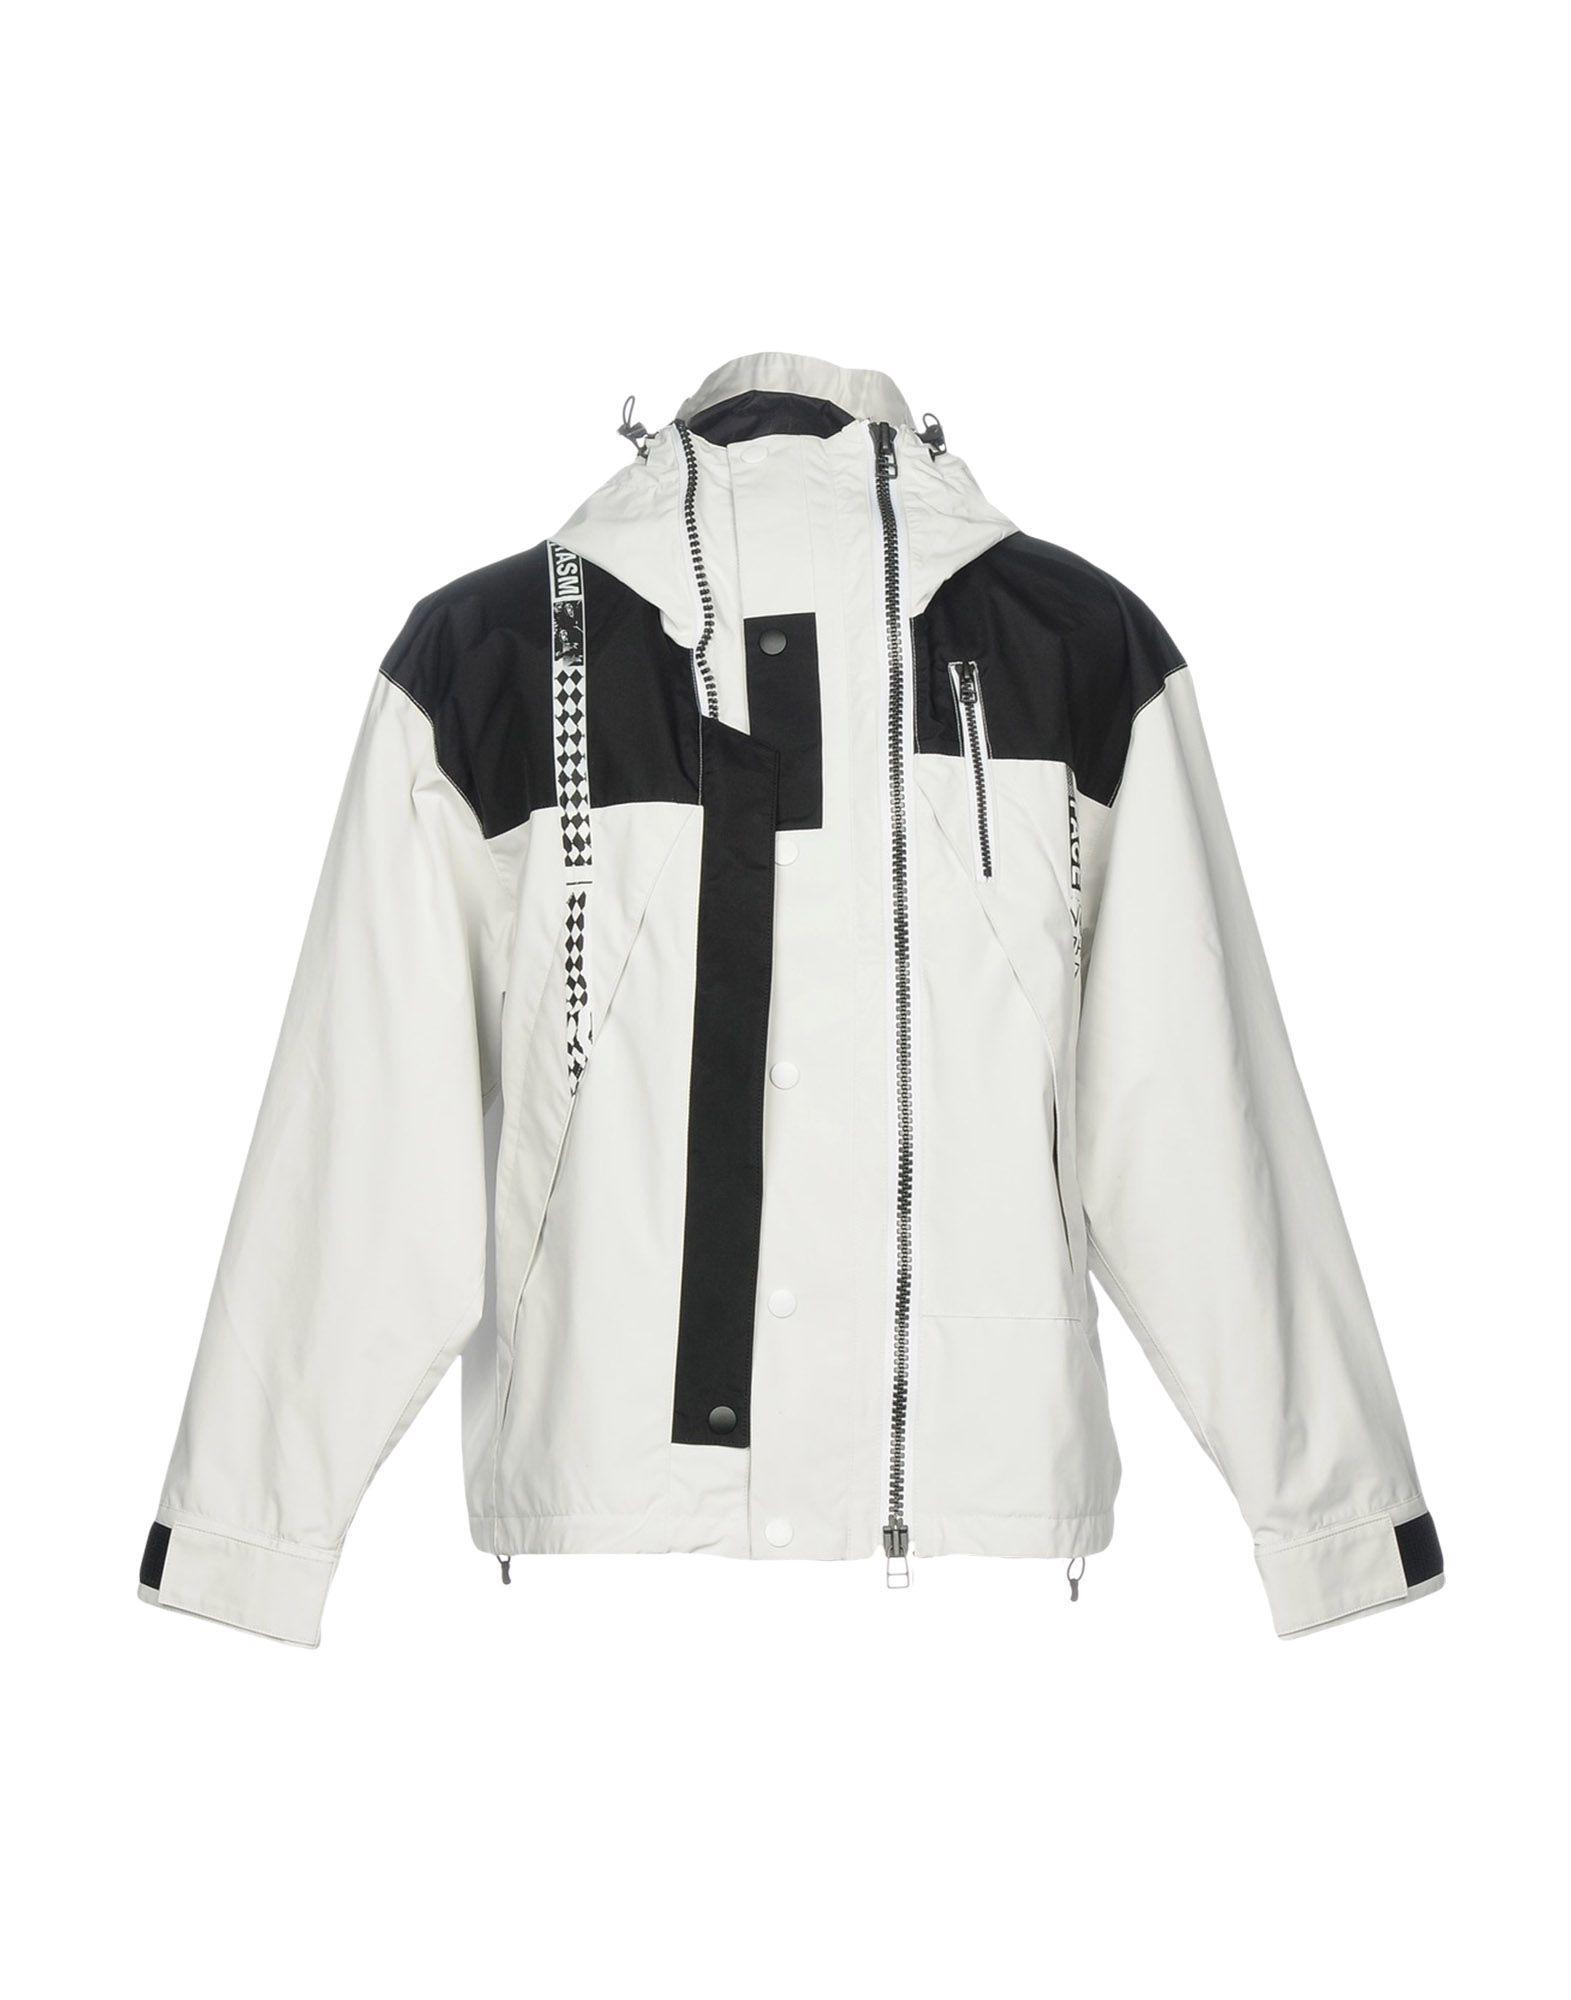 Facetasm Jackets In White